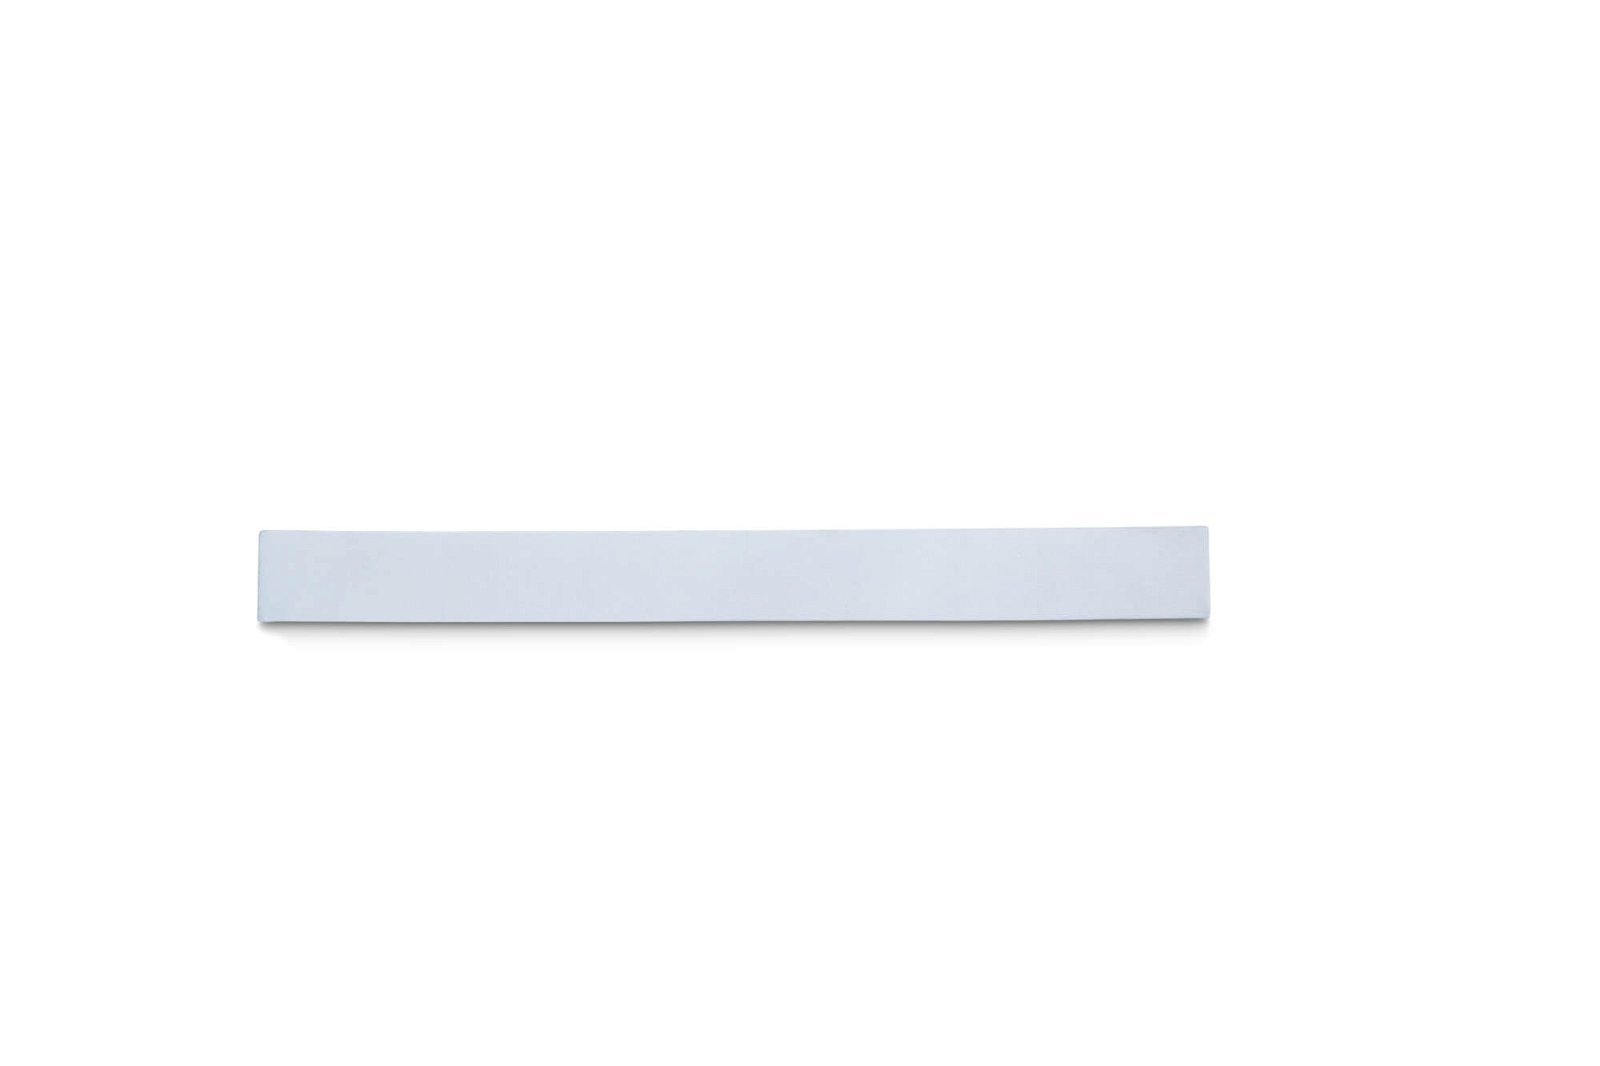 Ferroleiste MAULsolid, Edelstahl, Länge 50 cm, silber